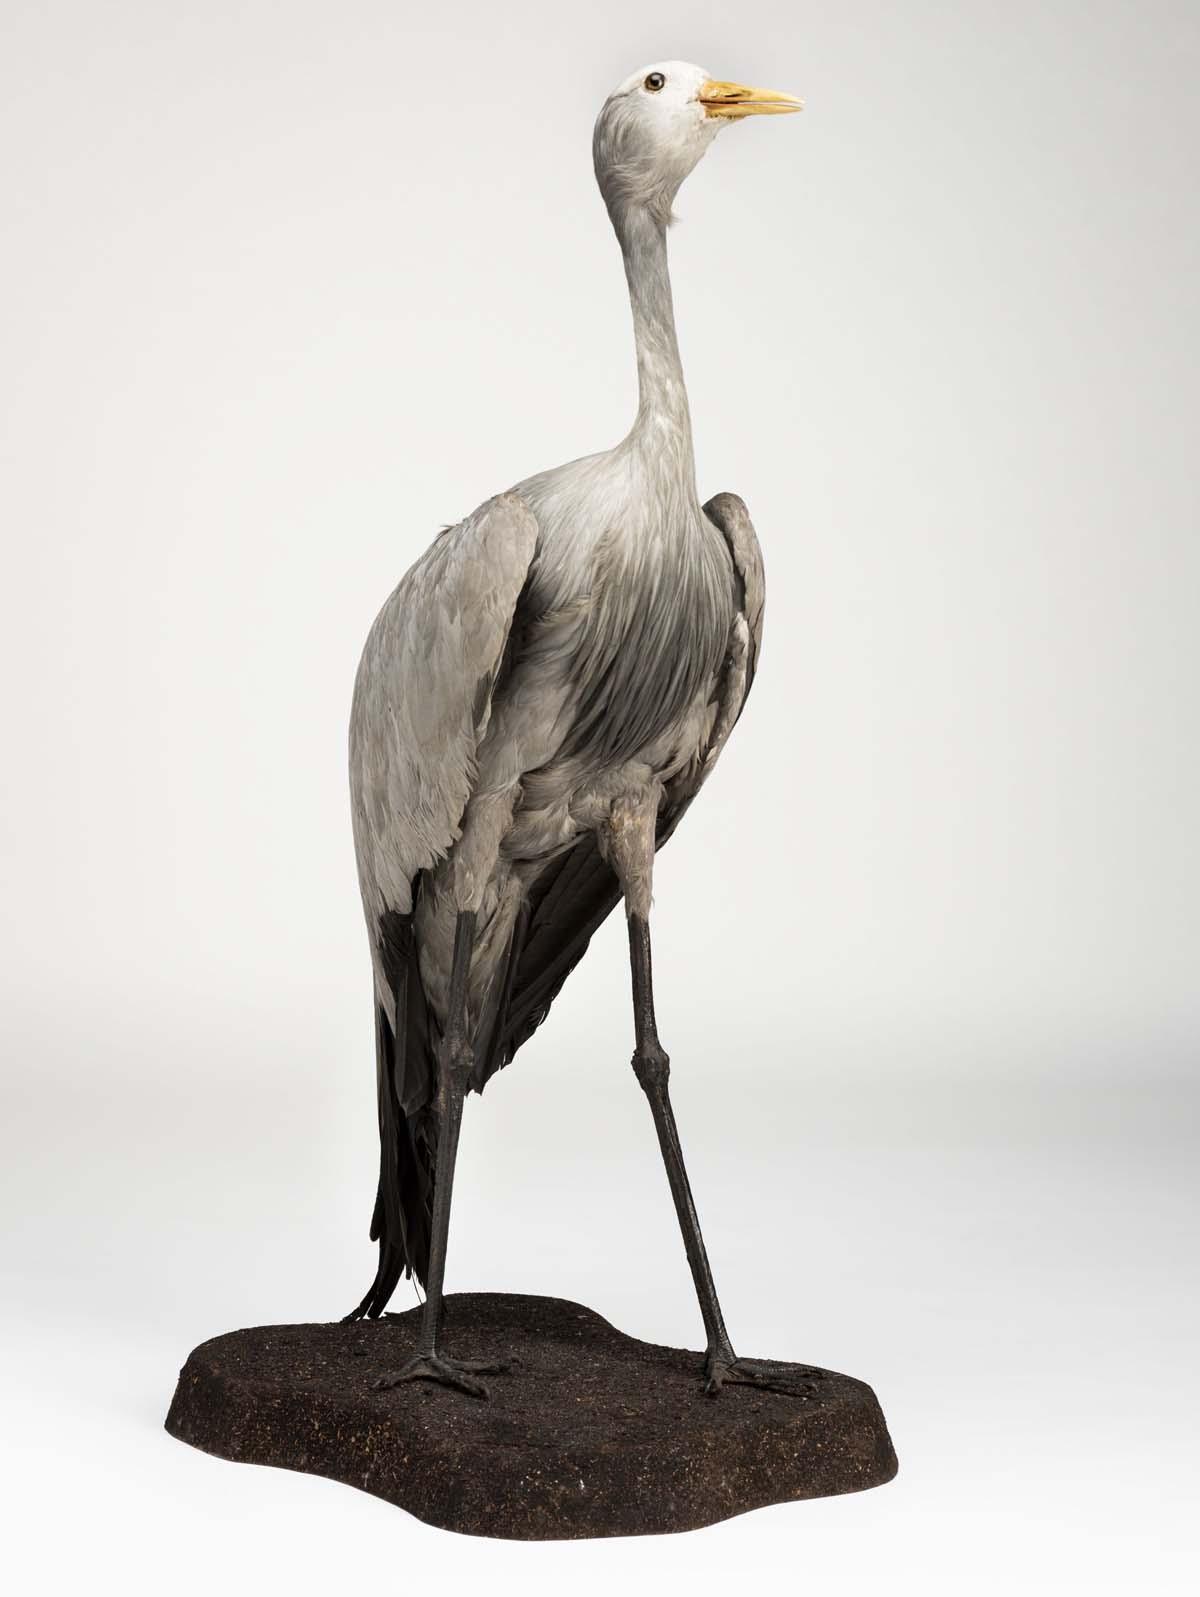 photo of a stuffed crane bird